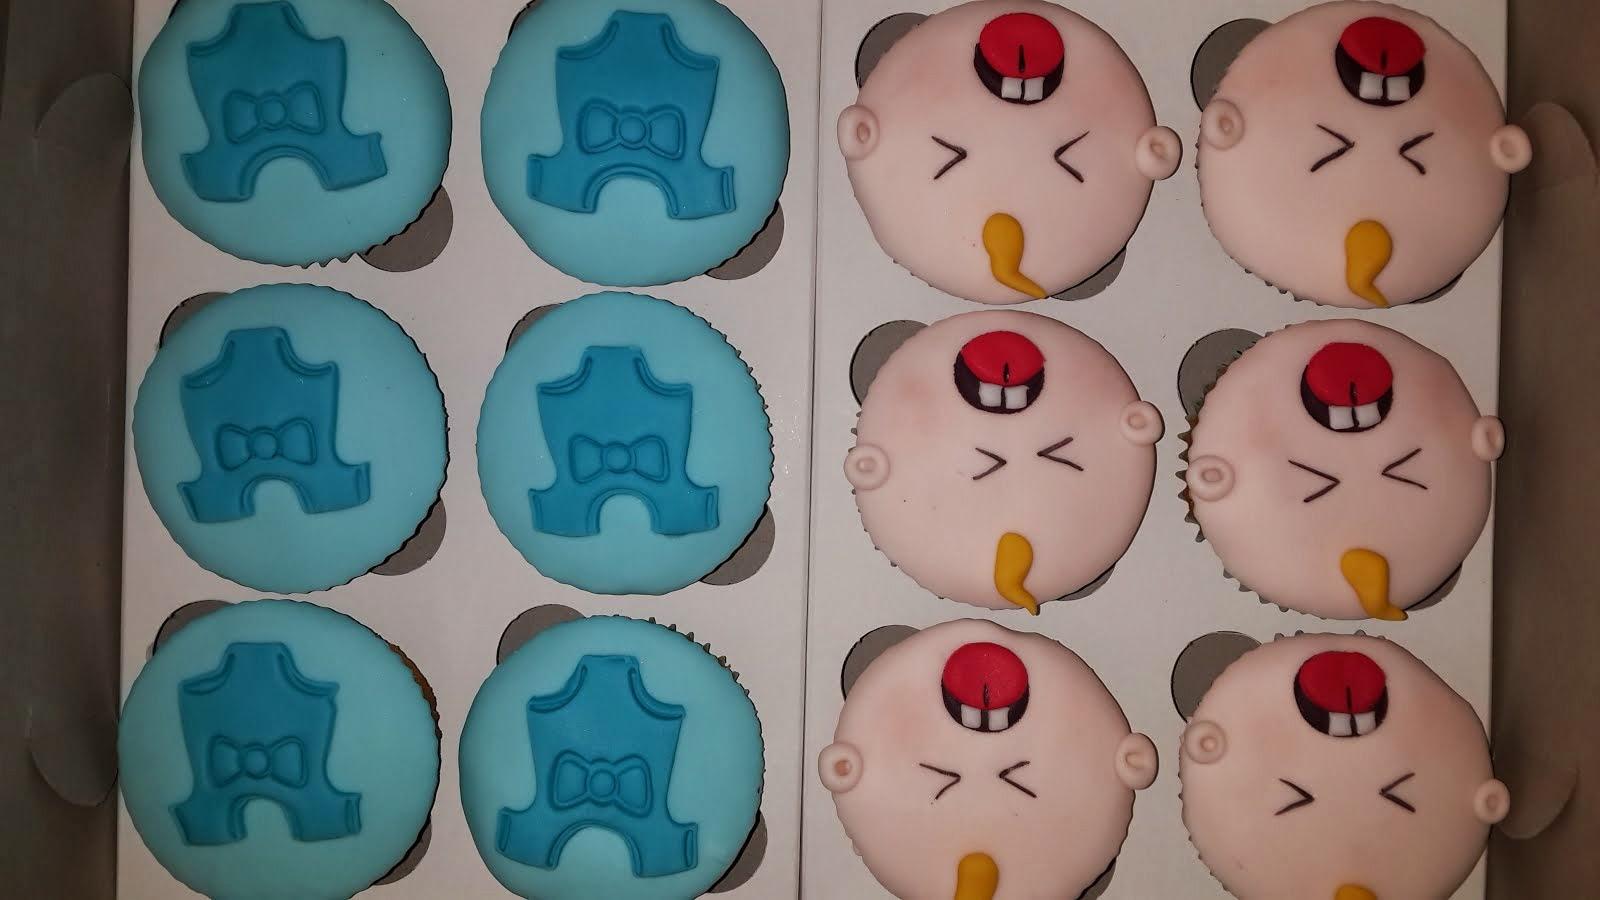 It's a boy - Cupcakes